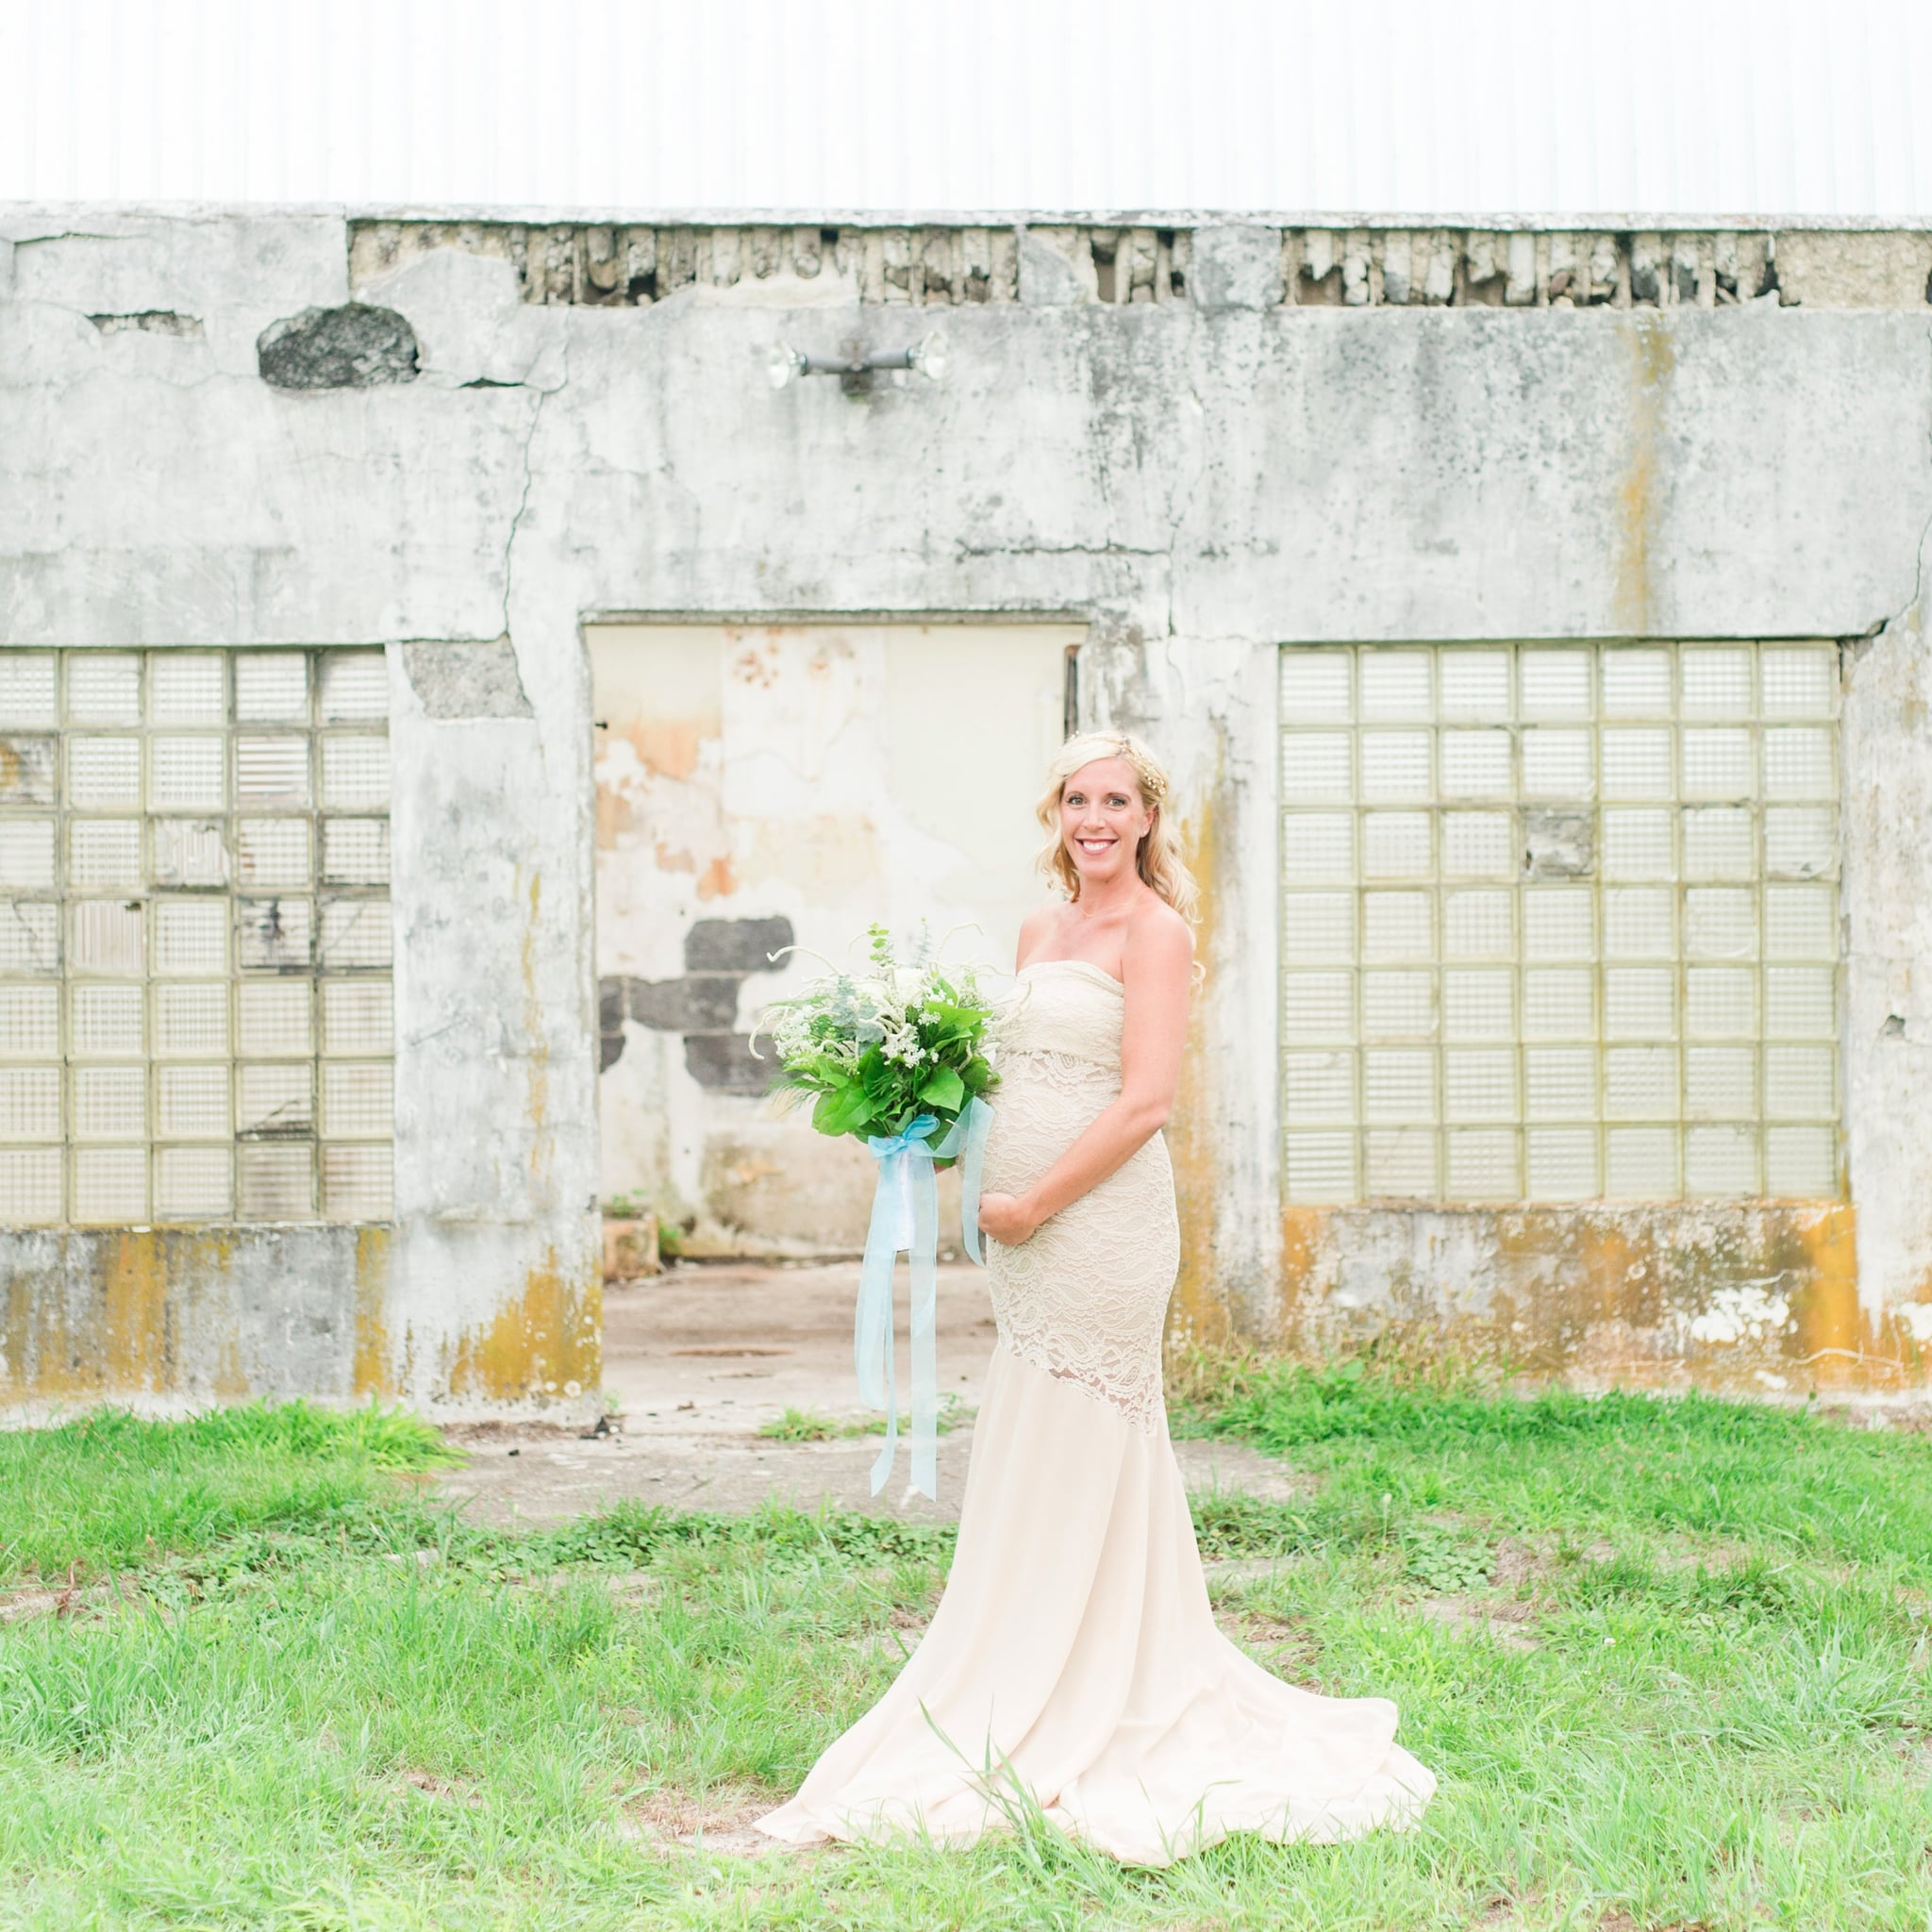 Maternity Wedding Dresses | POPSUGAR Moms